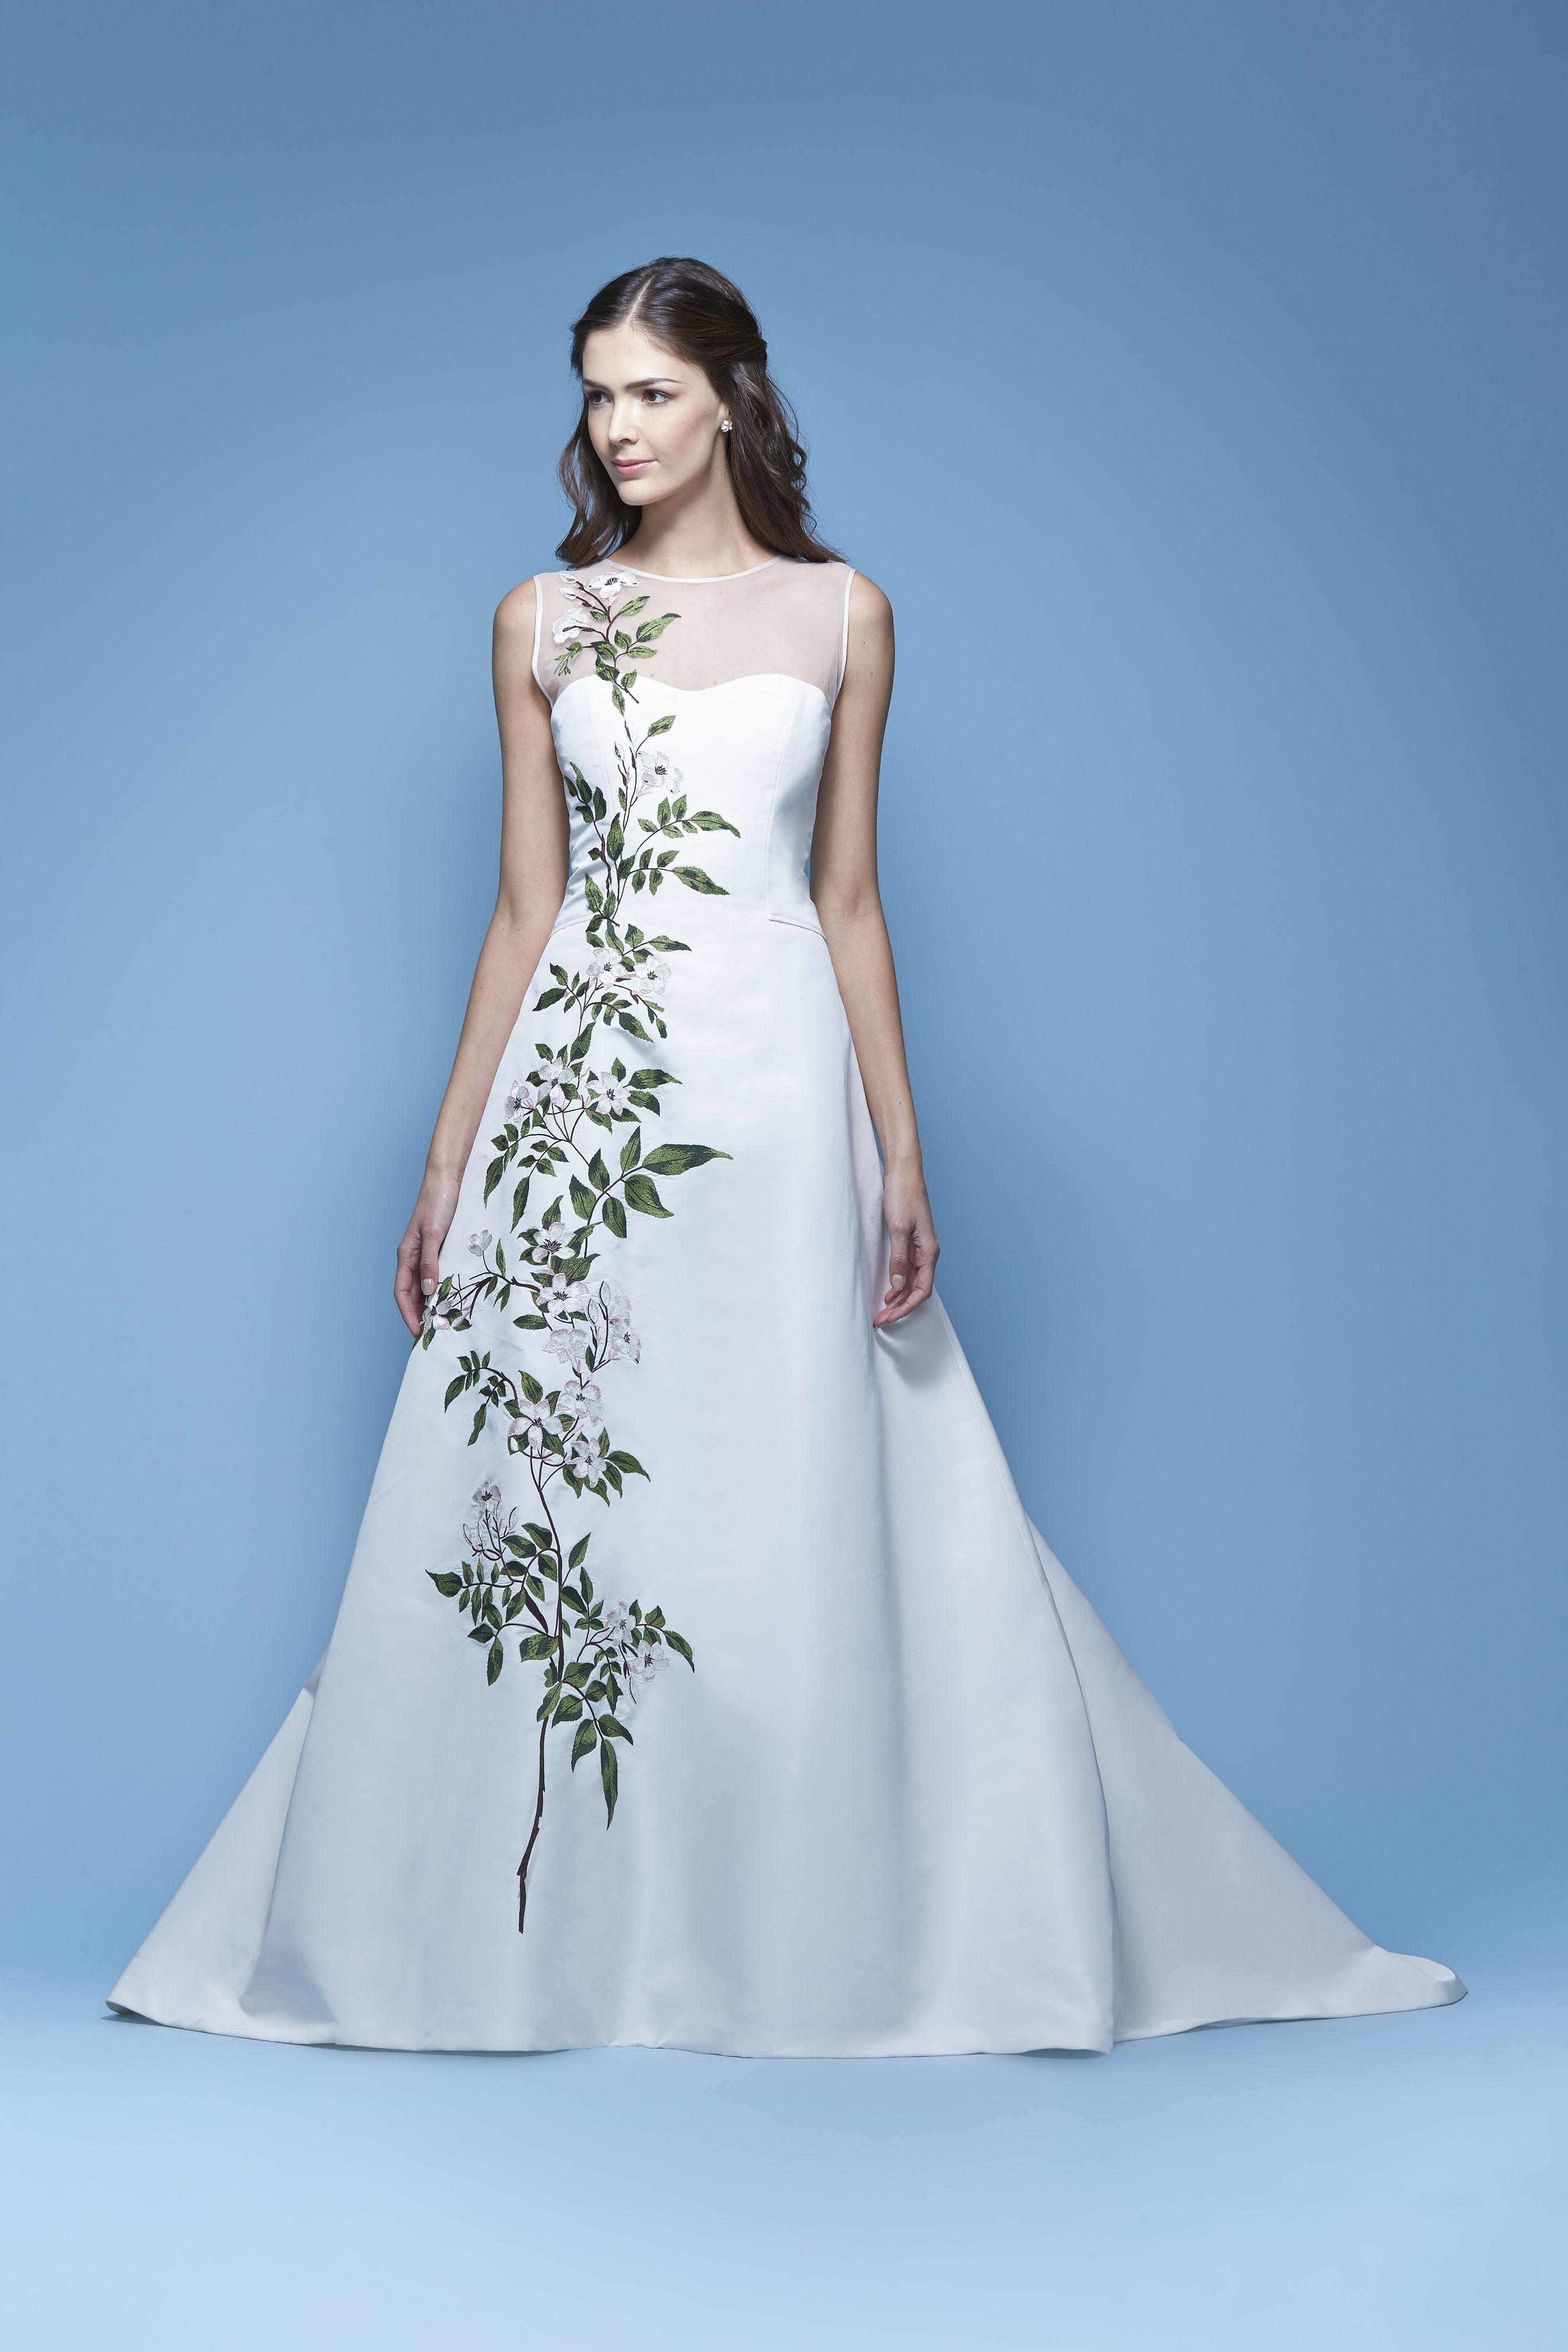 Carolina Herrera Bridal Spring 2016 \'Jasmine\' bridal gown   Vestidos ...